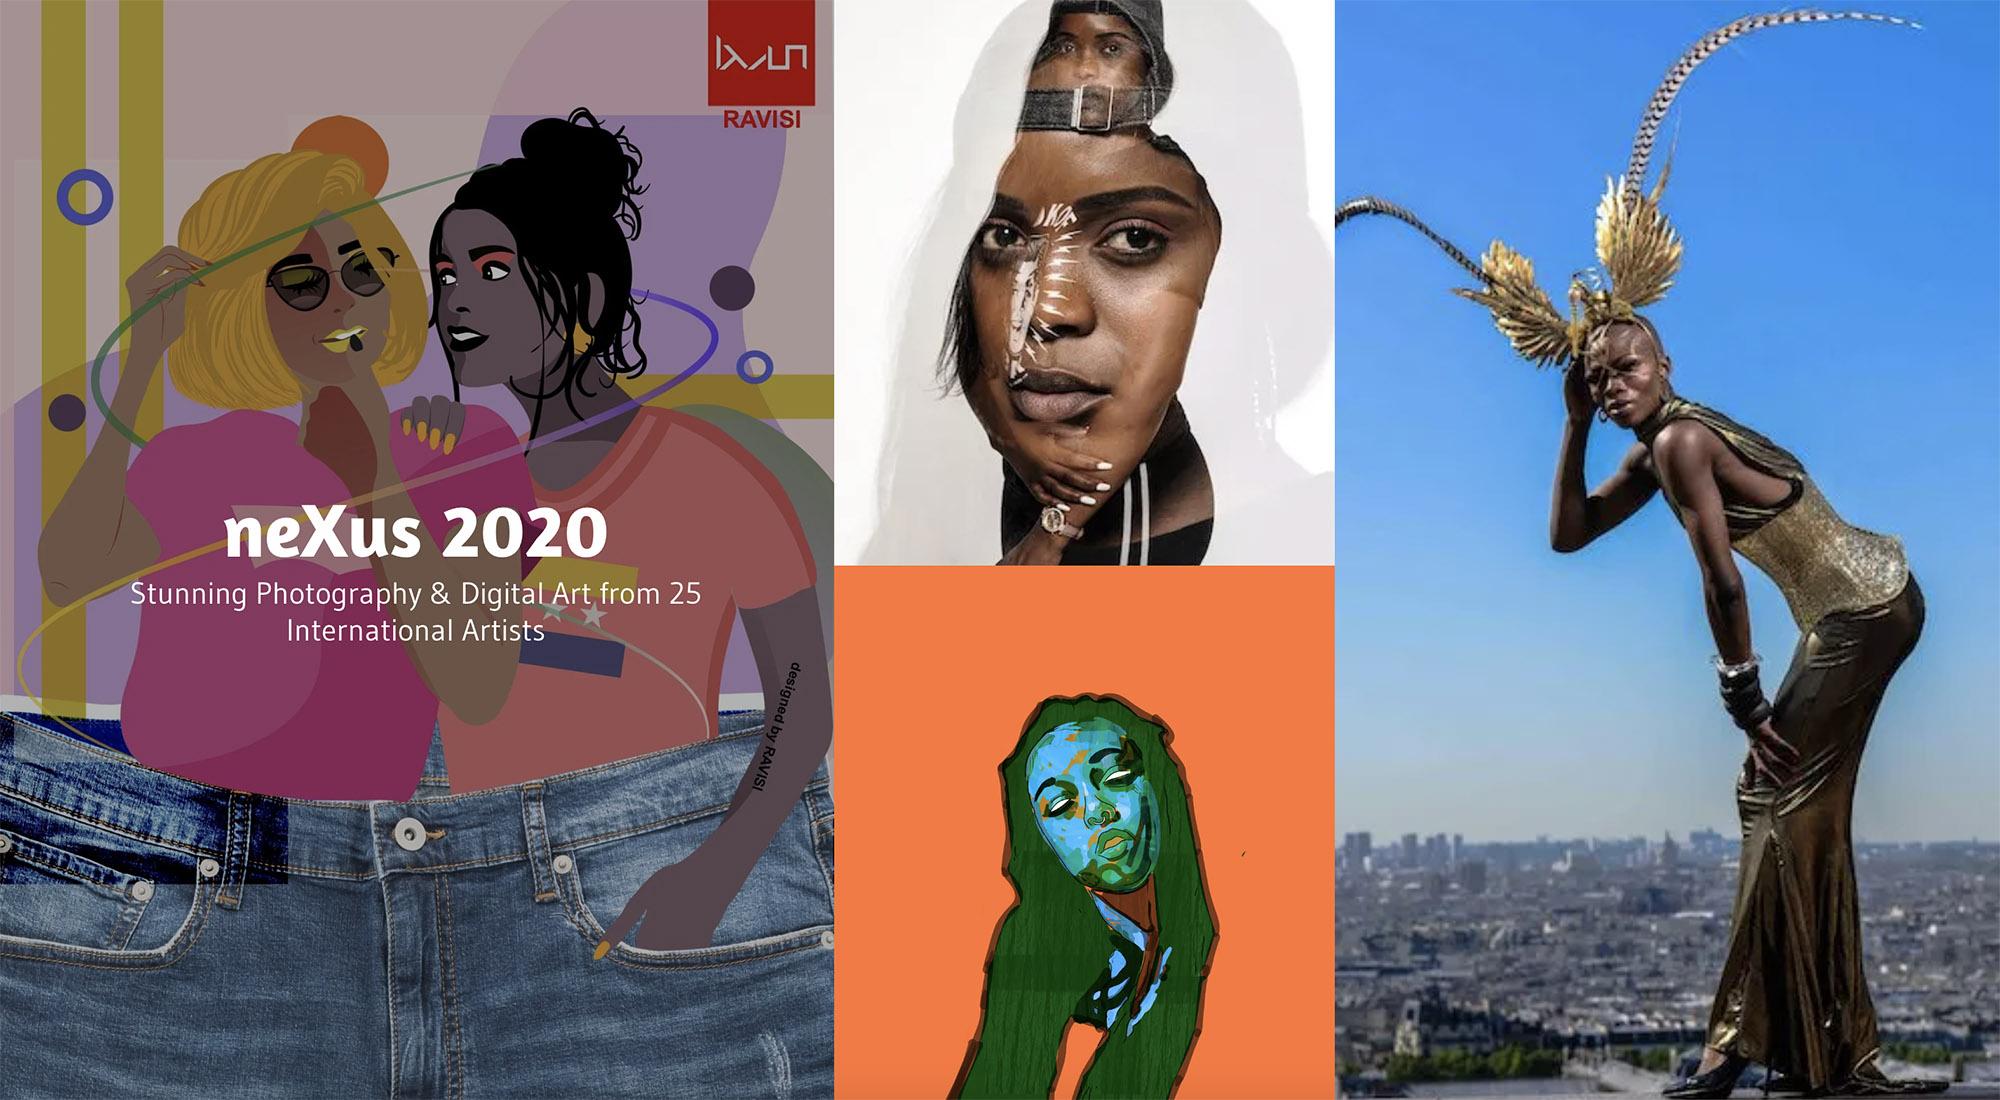 Pride Supports Nexus 2020 Arts Exchange